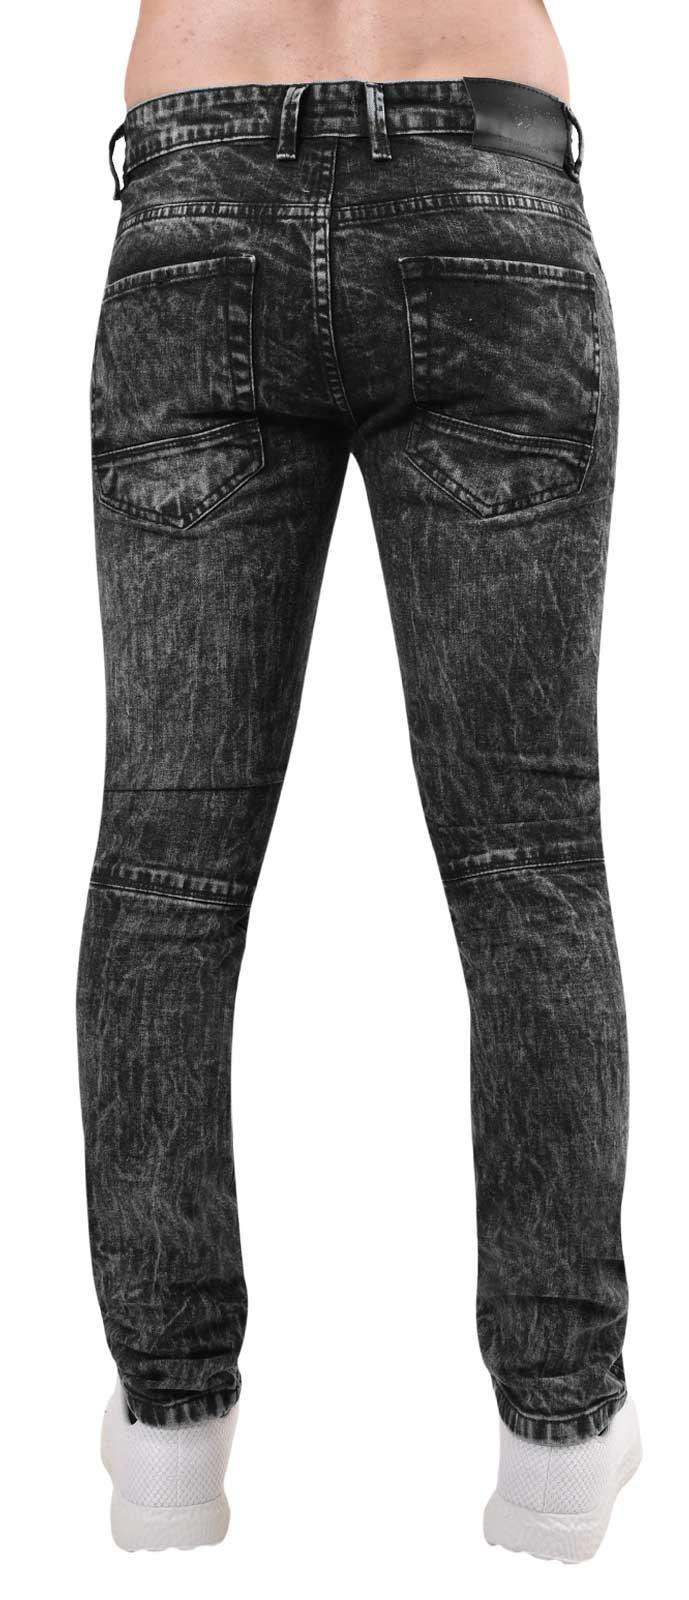 "^ SVENDITA STOCK ^ MEN/'S Blu Chiusura a Bottone Pantaloni Taglia 34/"""